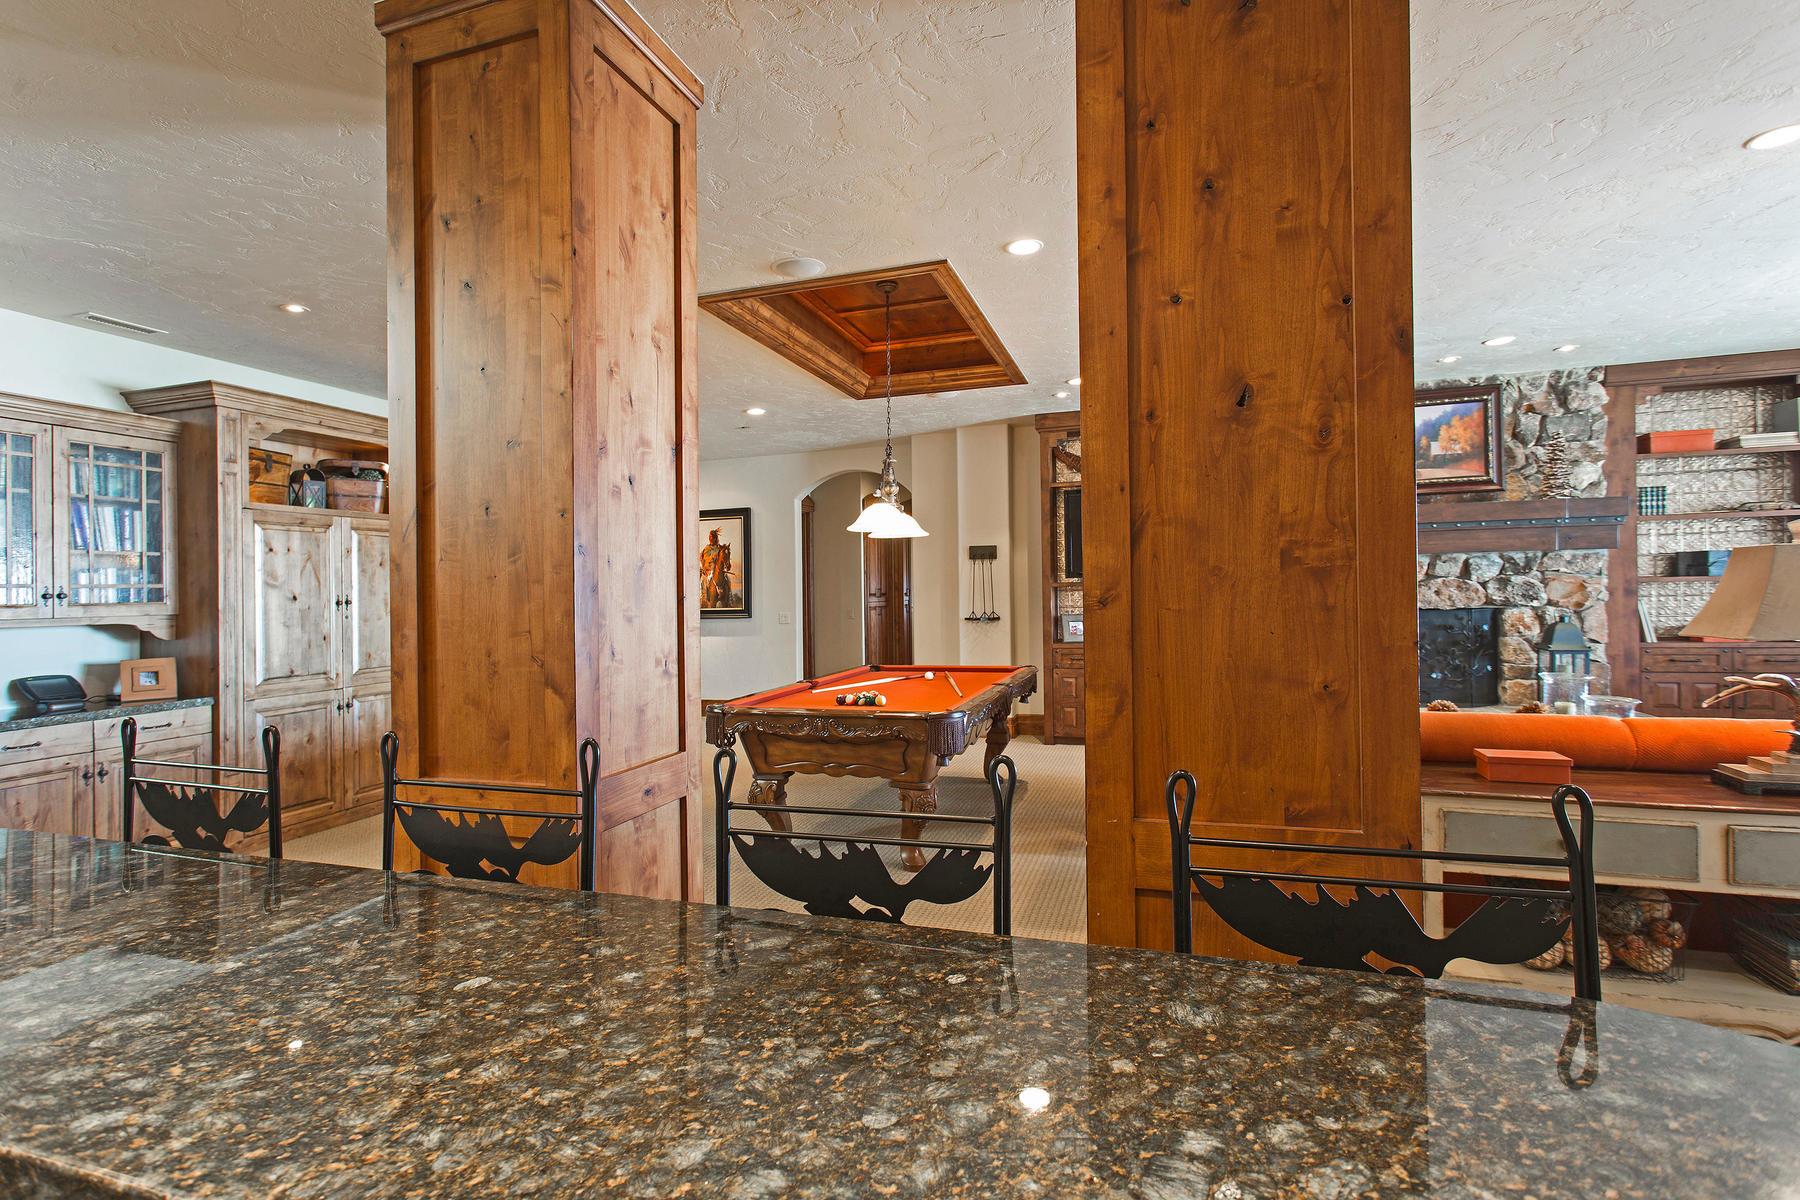 Additional photo for property listing at Casa Cielo, Above the Clouds in Deer Crest 3300 W Deer Crest Estates Dr Park City, Utah 84060 United States